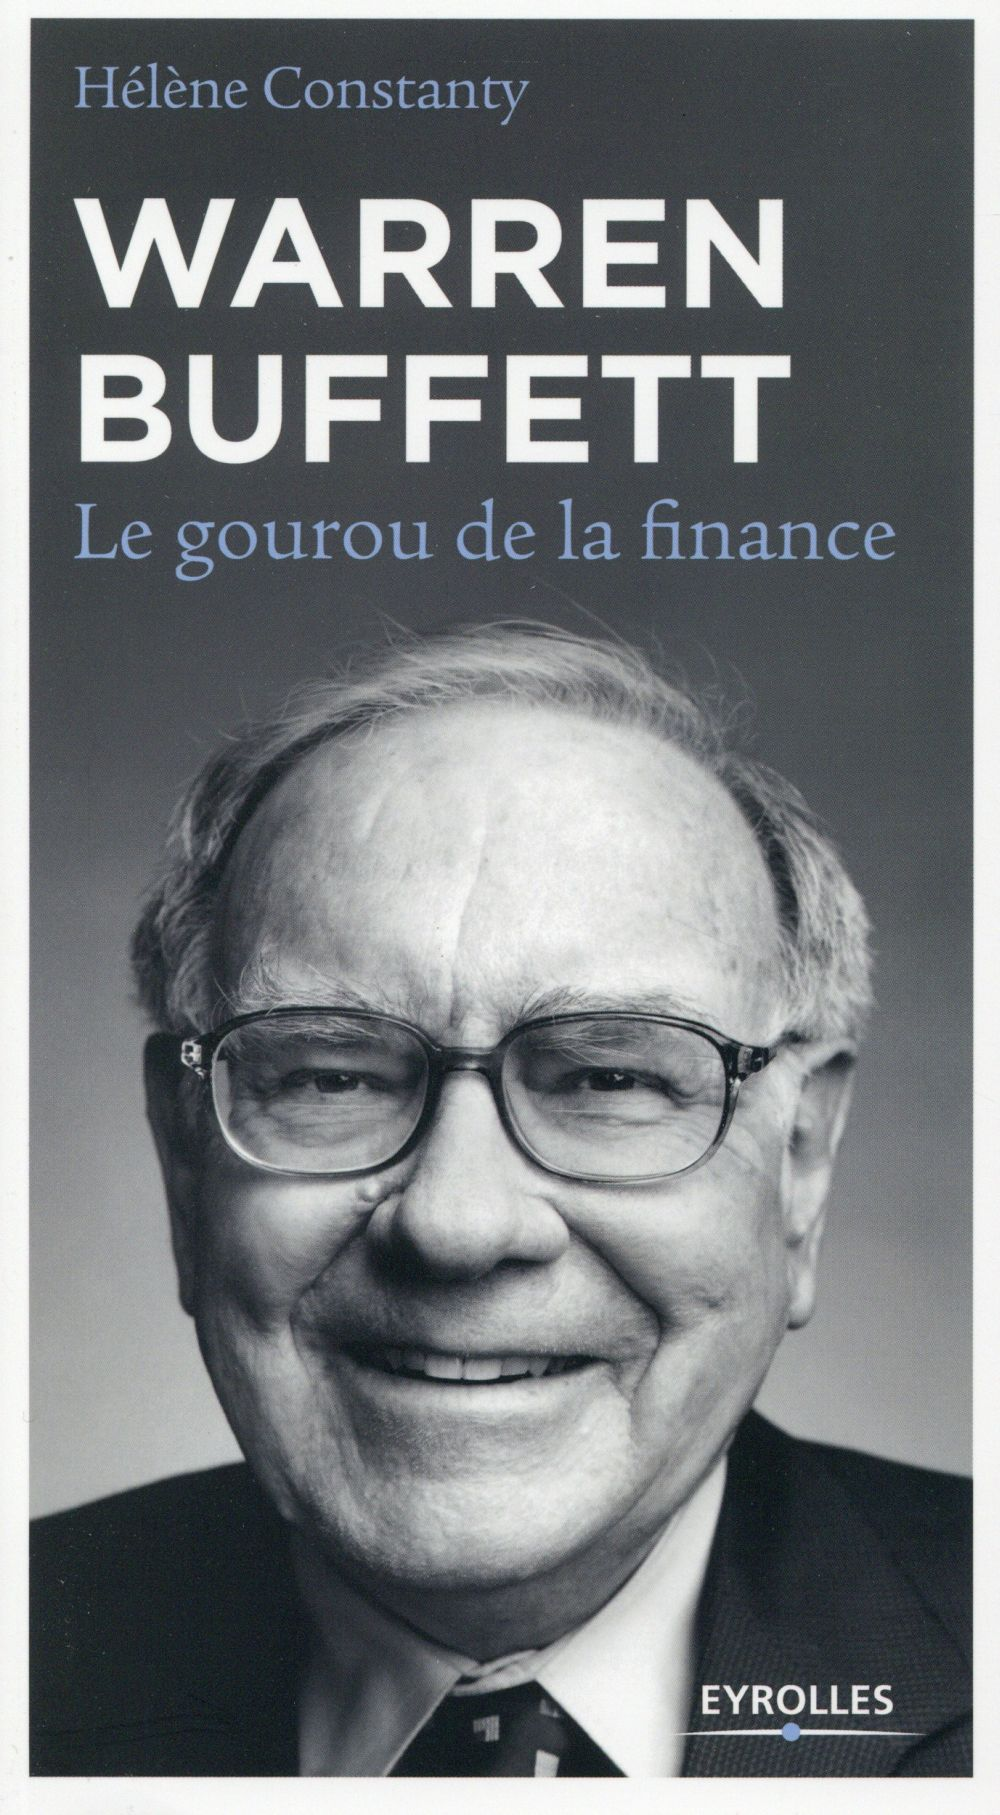 Warren Buffett ; le gourou de la finance (3e édition)